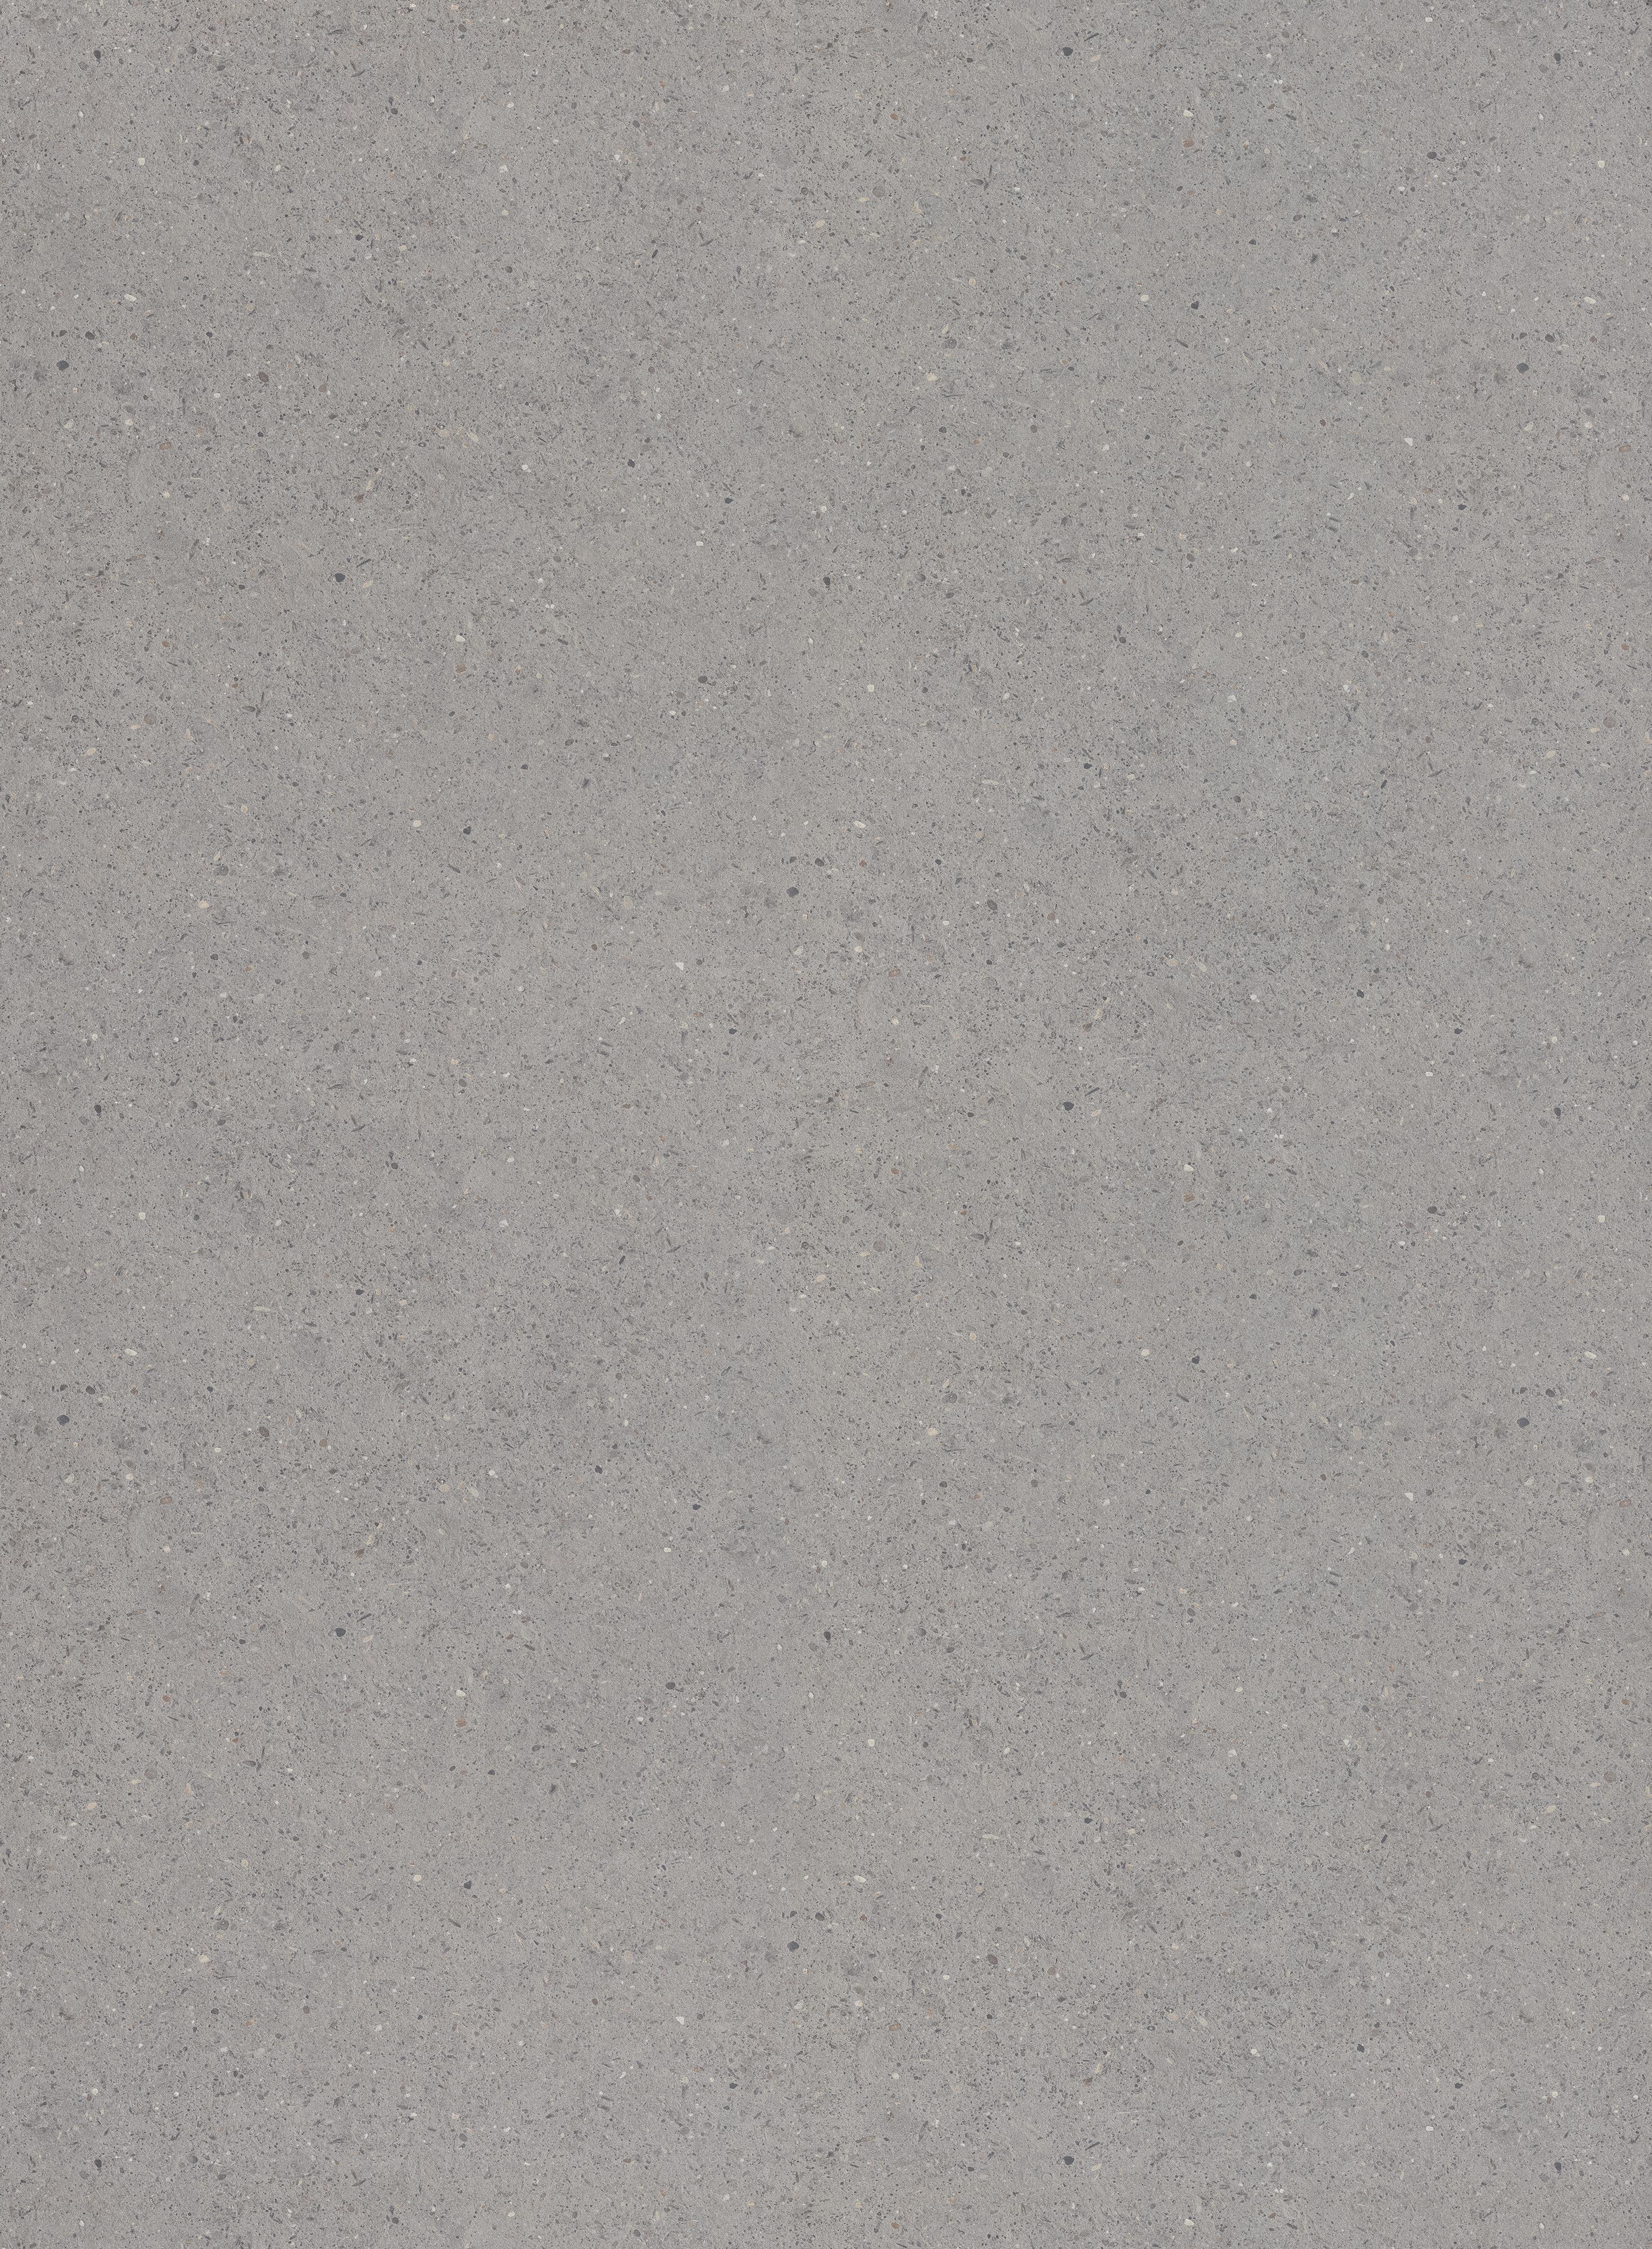 DecoLegno FC69 Concreta - Hele plaatafbeelding